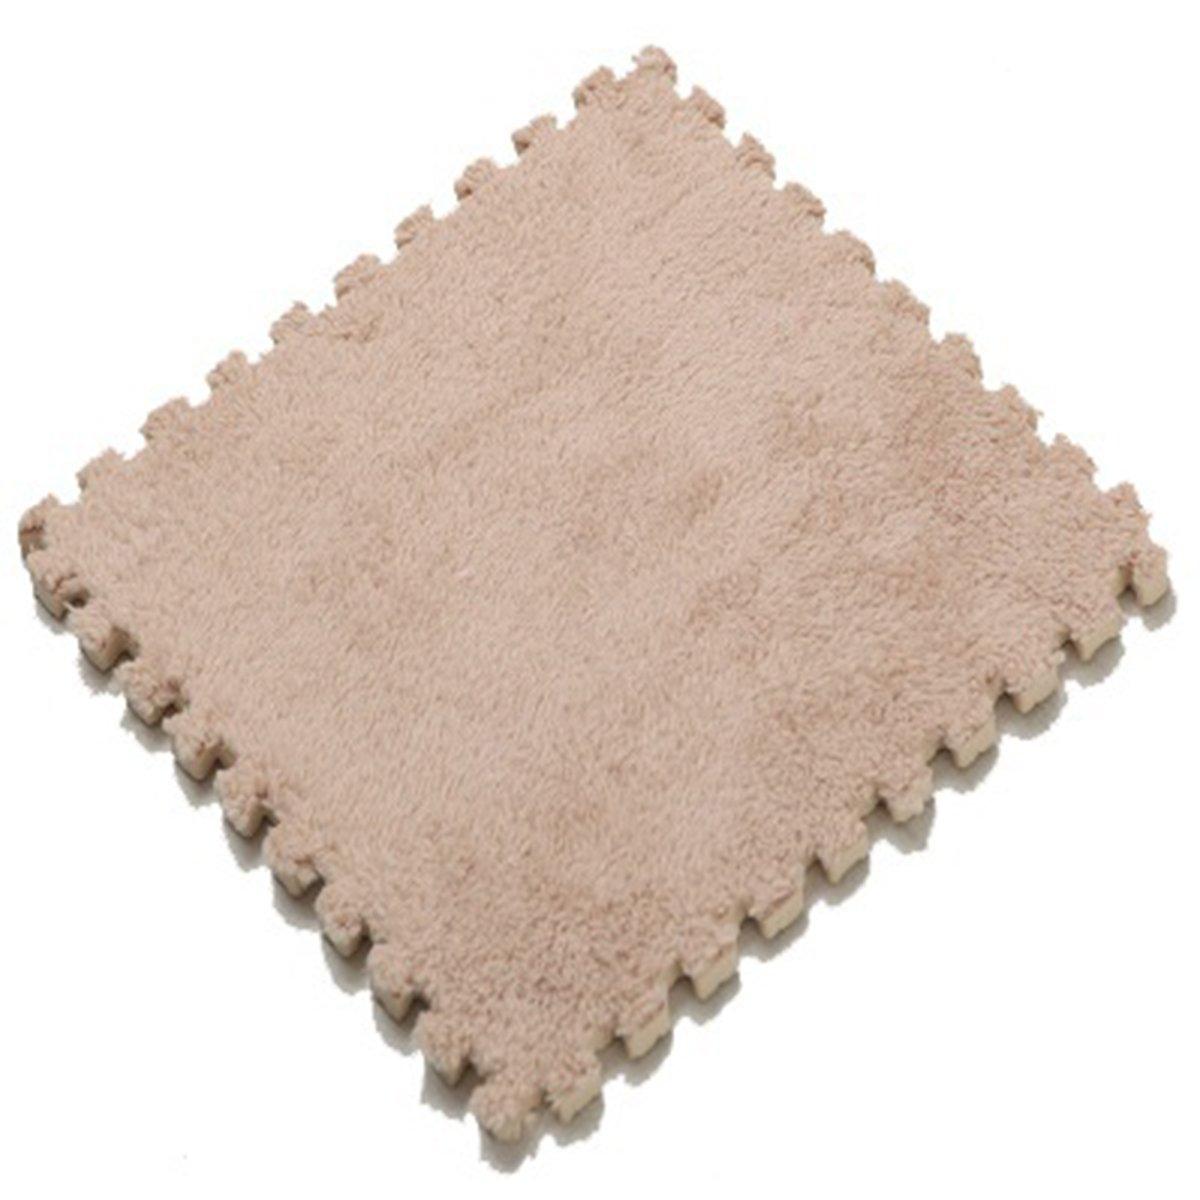 Furry Plush Eva Foam Anti-slip & Durable Carpet Rug Soft Cushion Mats - Set of 9 Tiles(12x12 inches)-Ideal for Nursery Decor,Playroom & Kids Baby Room (Light brown)